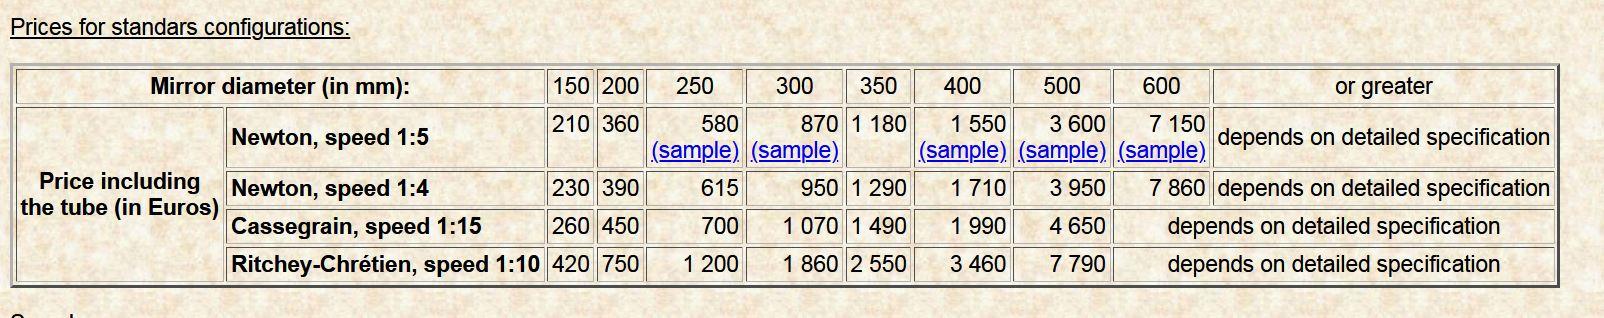 ff.JPG.96053e93050cf4ad14cb8bece0f59183.JPG